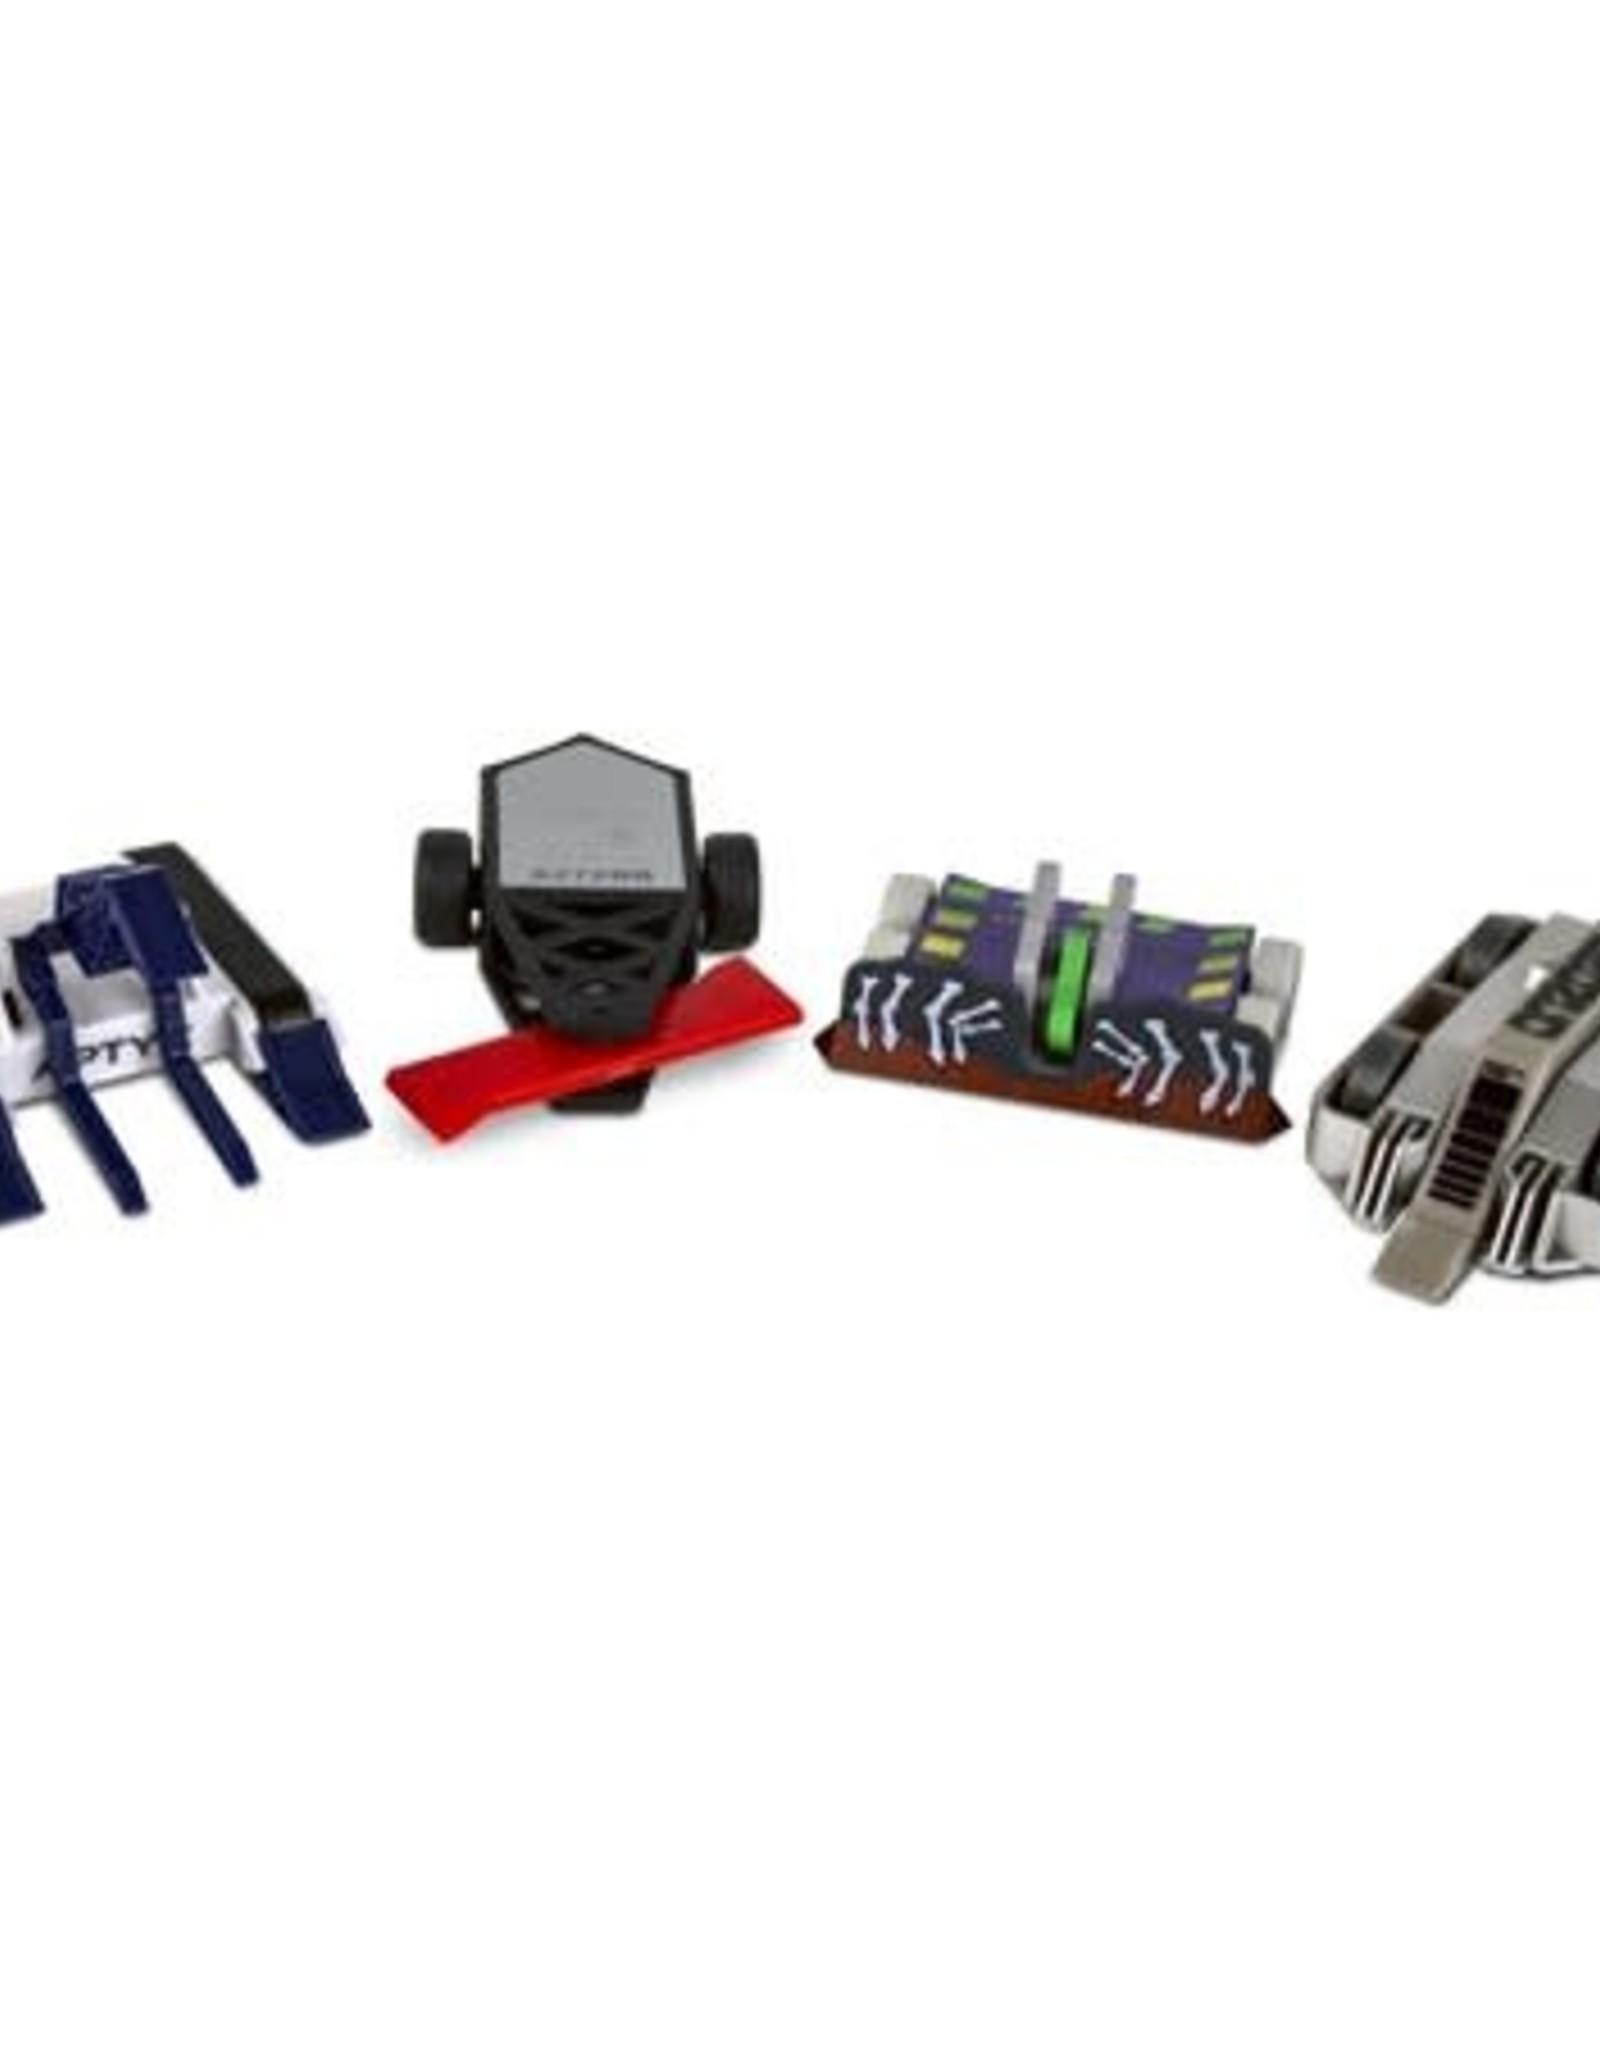 Battlebot Push Strike assortment